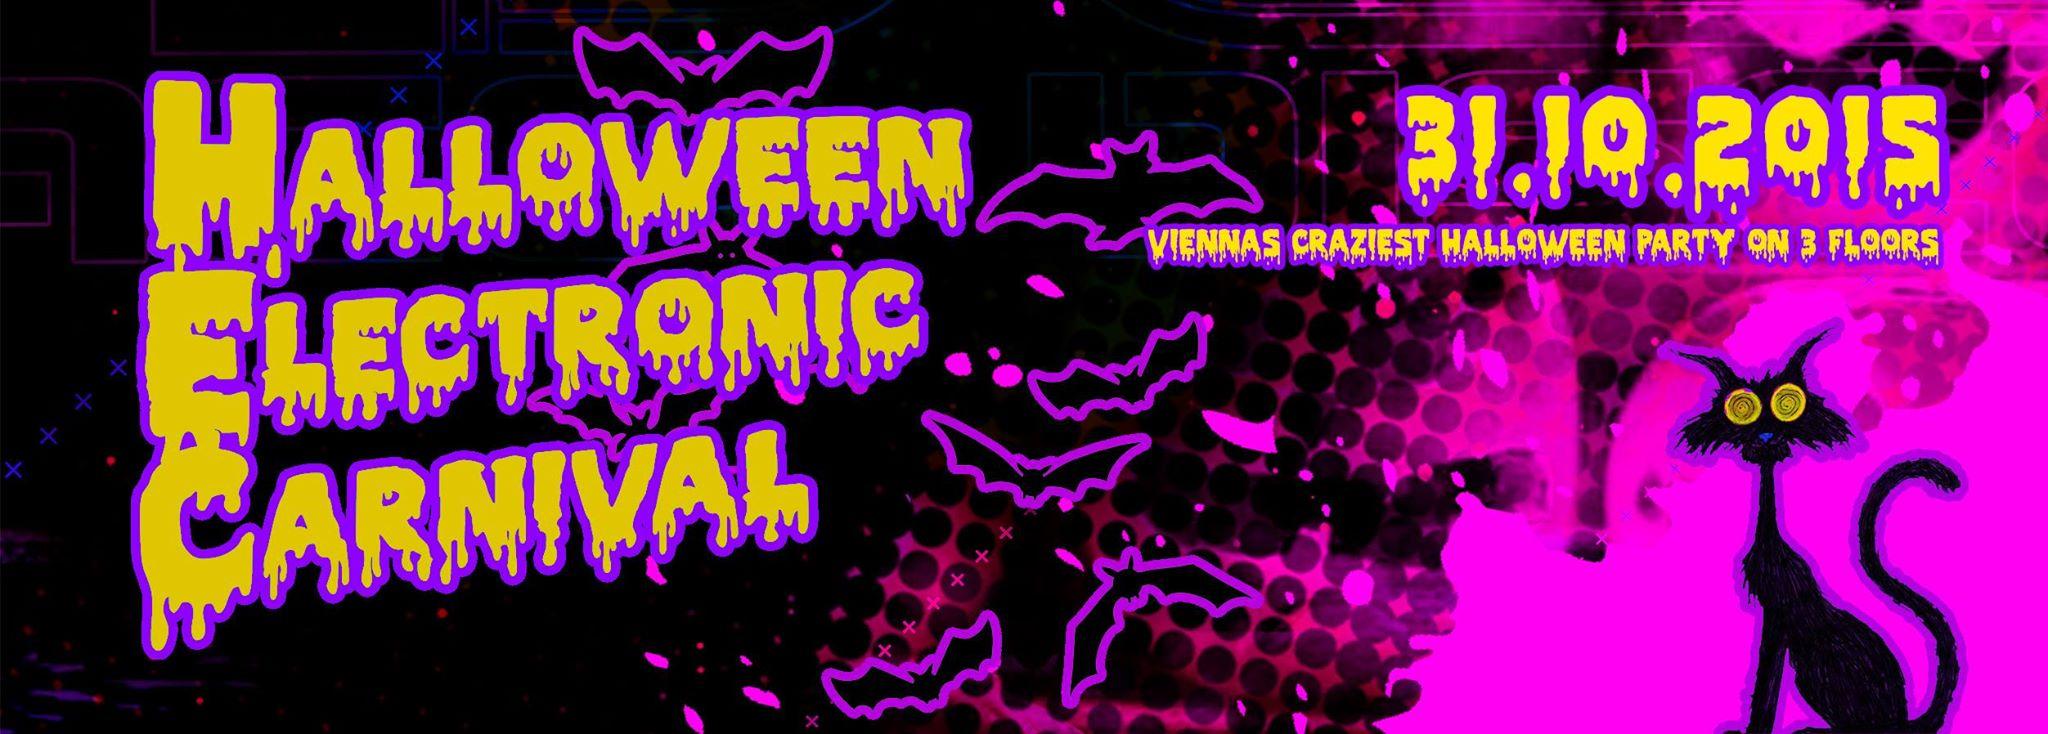 Halloween Electronic Carnival 2015